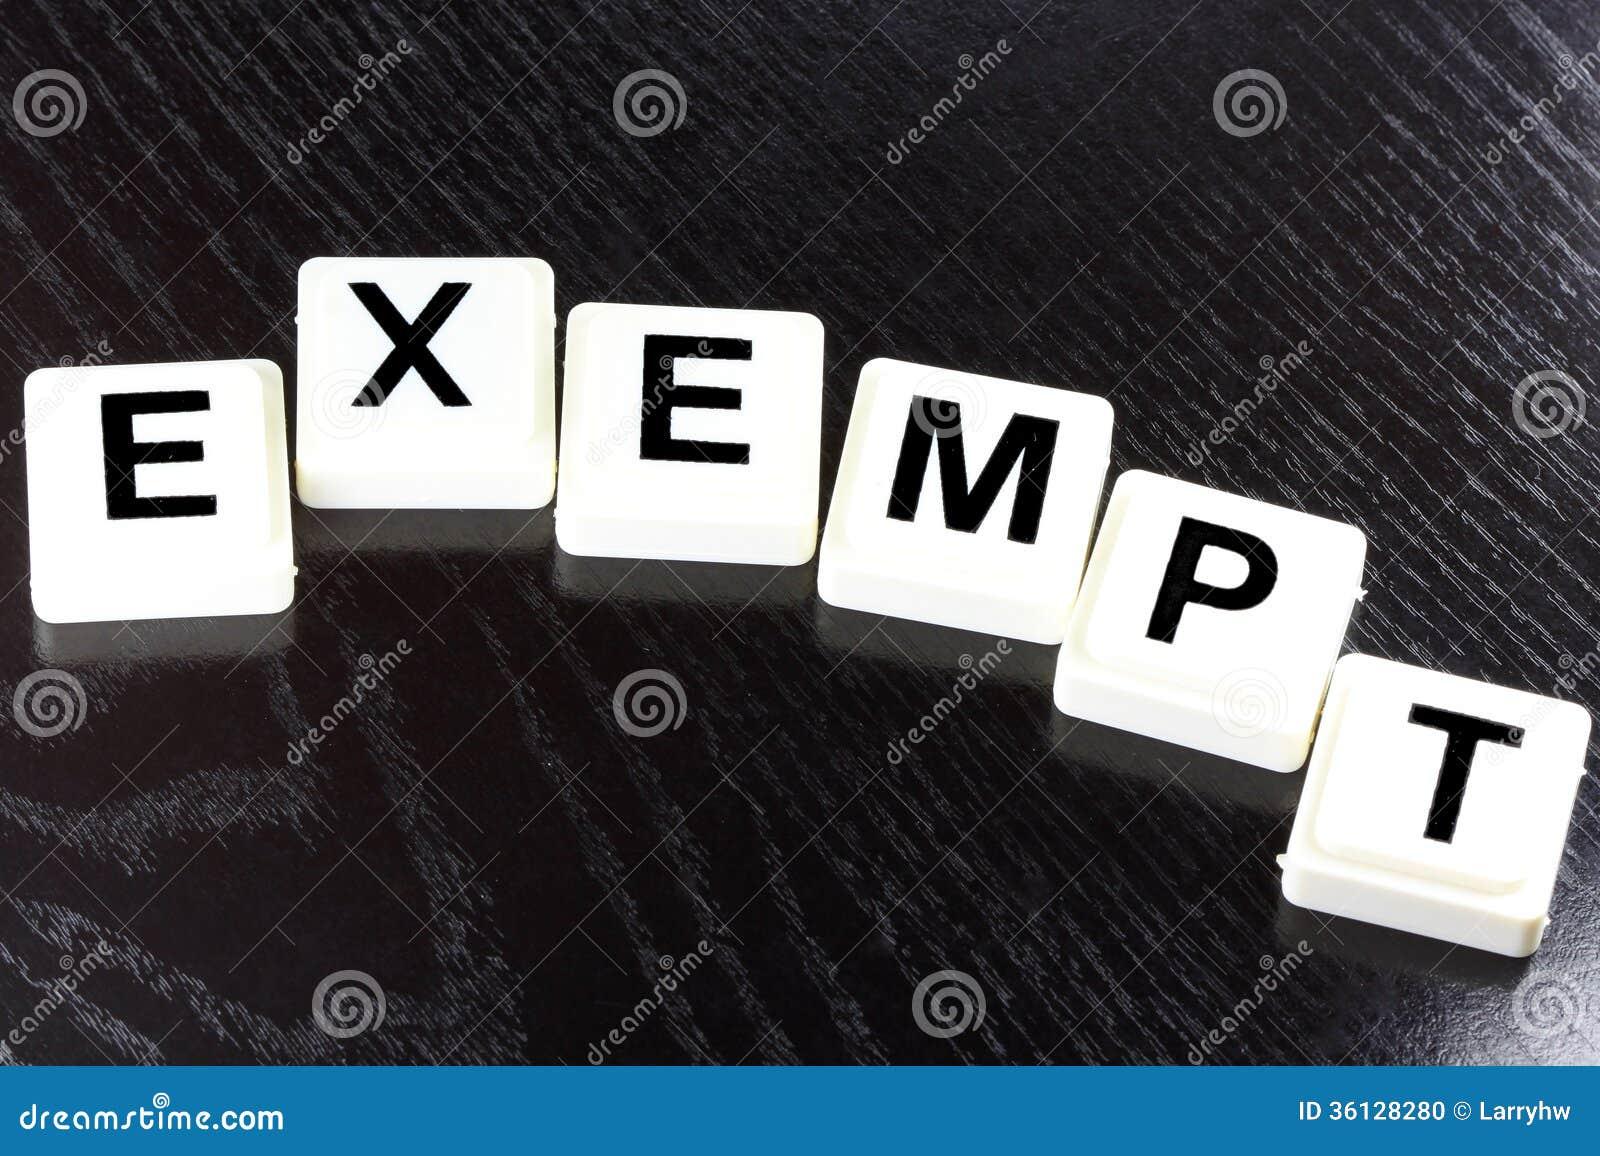 Exempt Stock Photo Image Of Word Vocabulary English